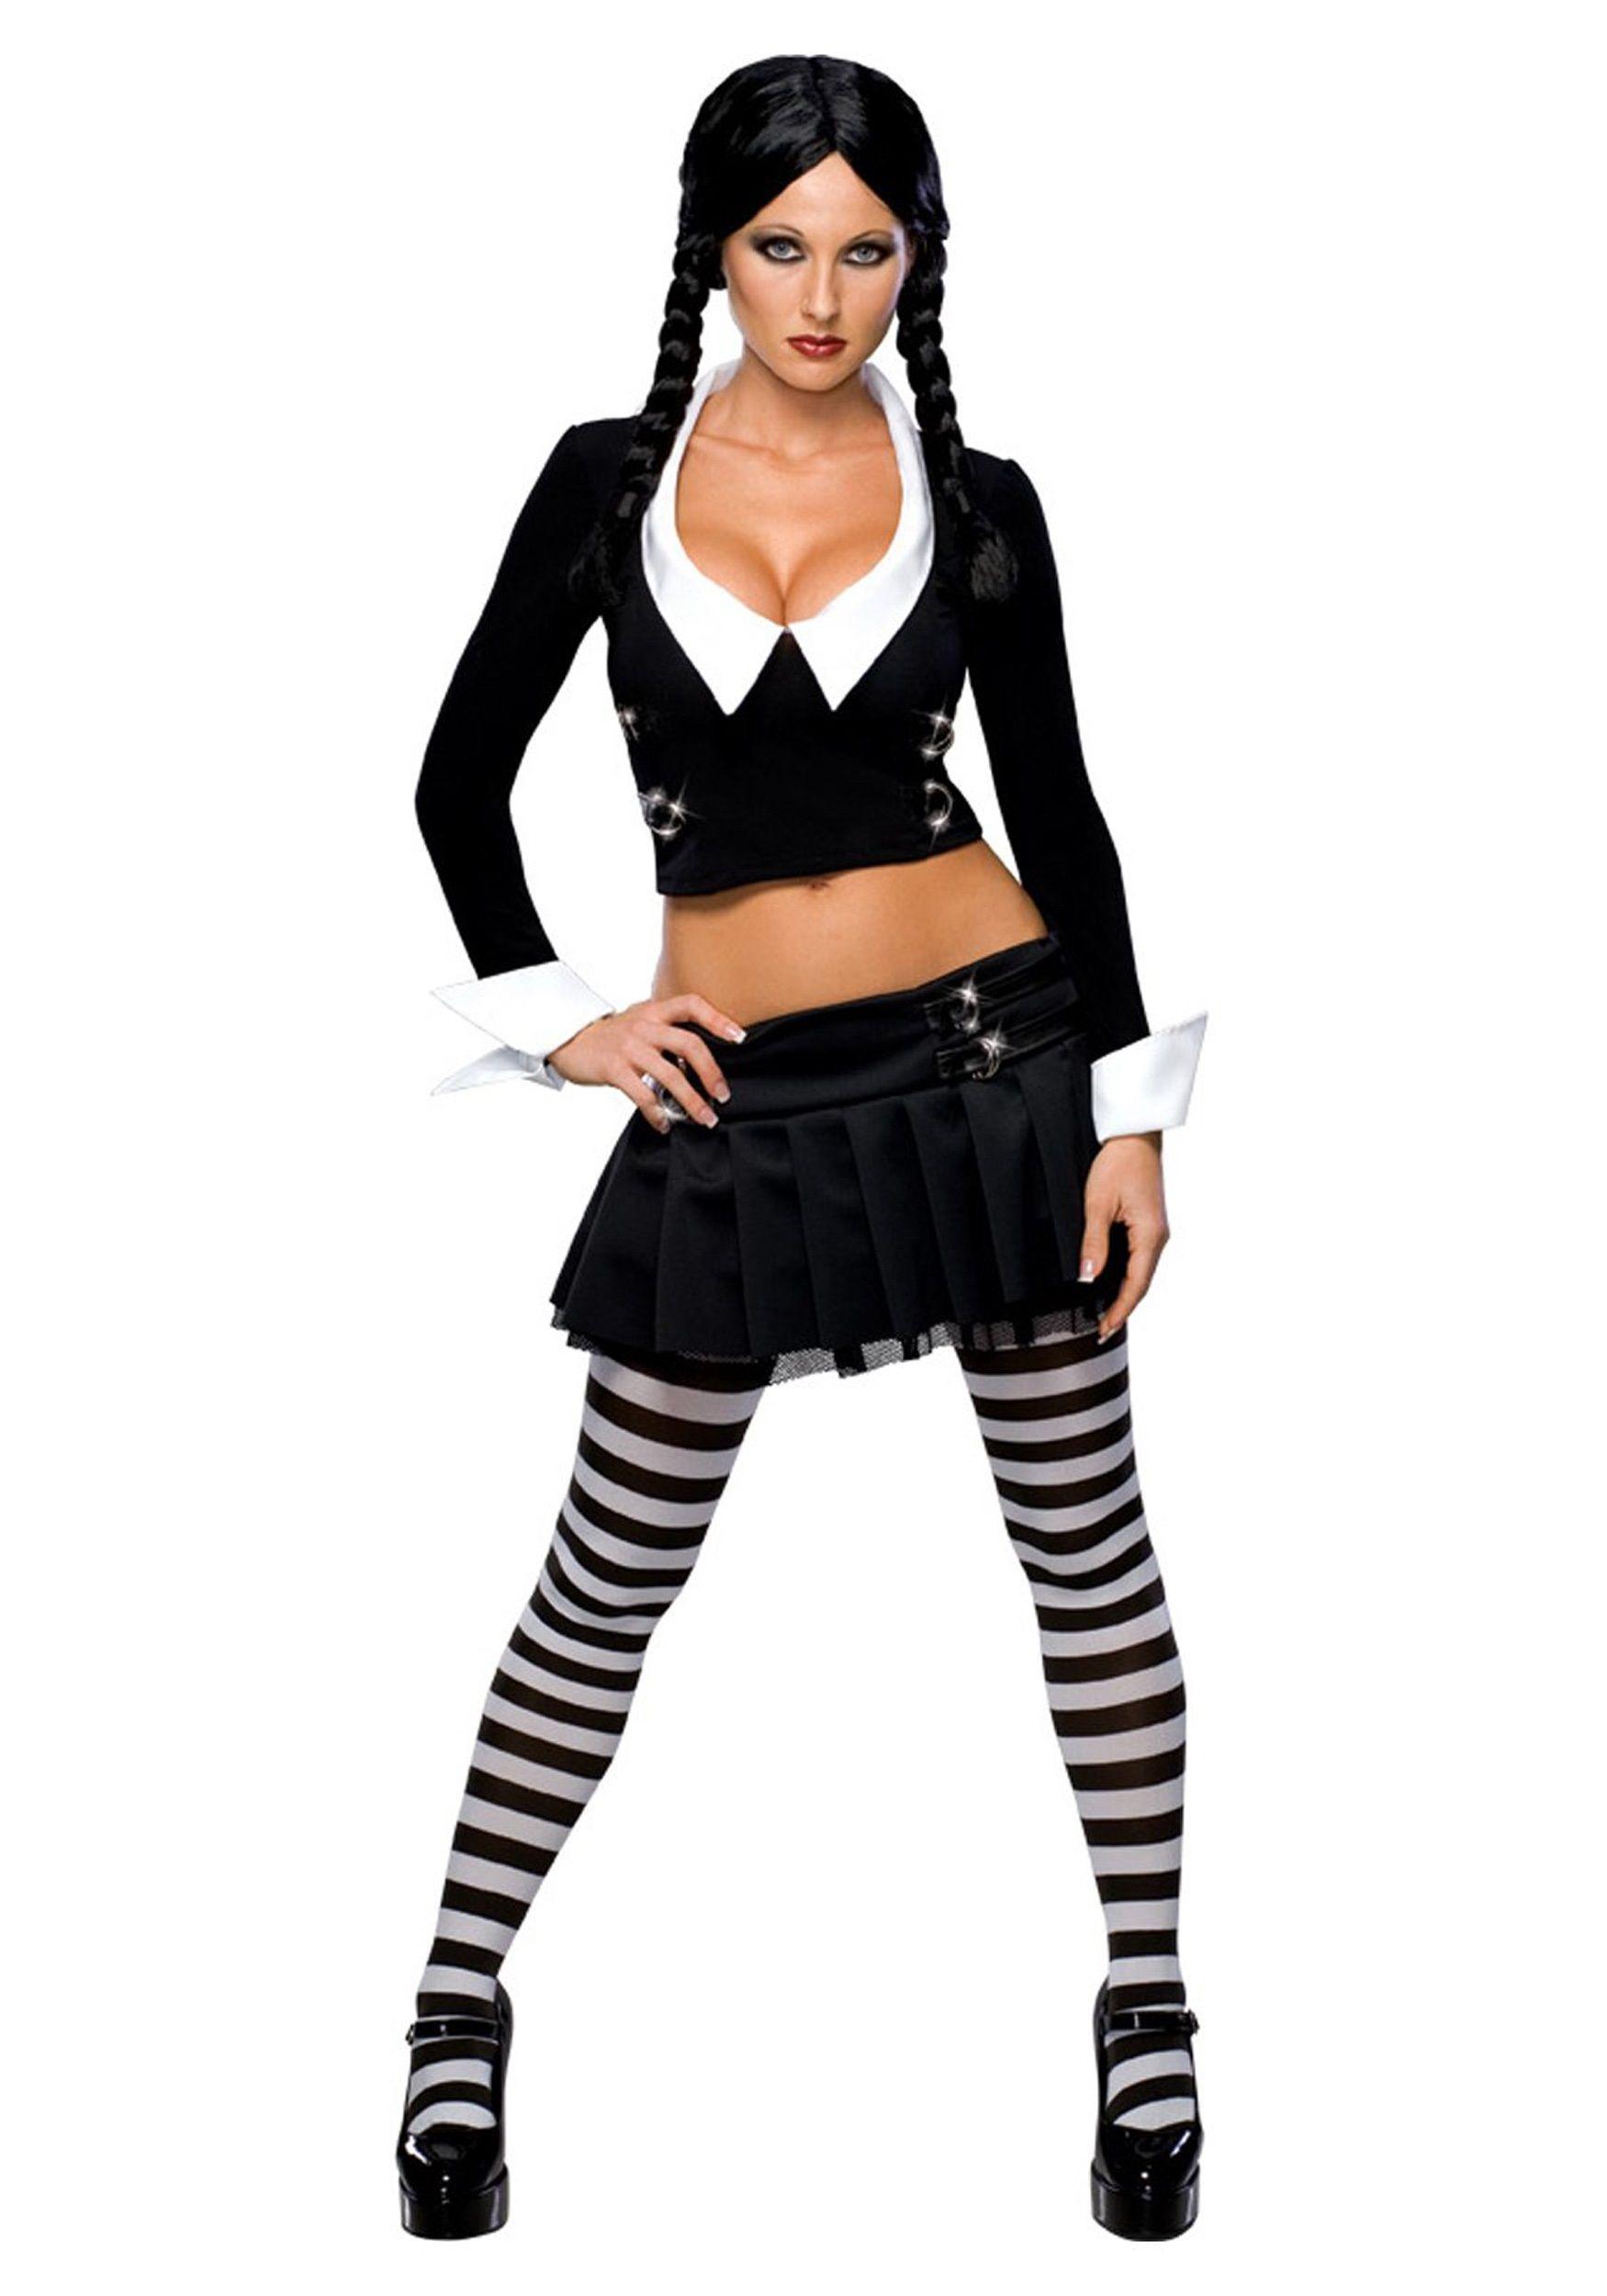 sexy wednesday addams costume - Halloween Costumes Wednesday Addams